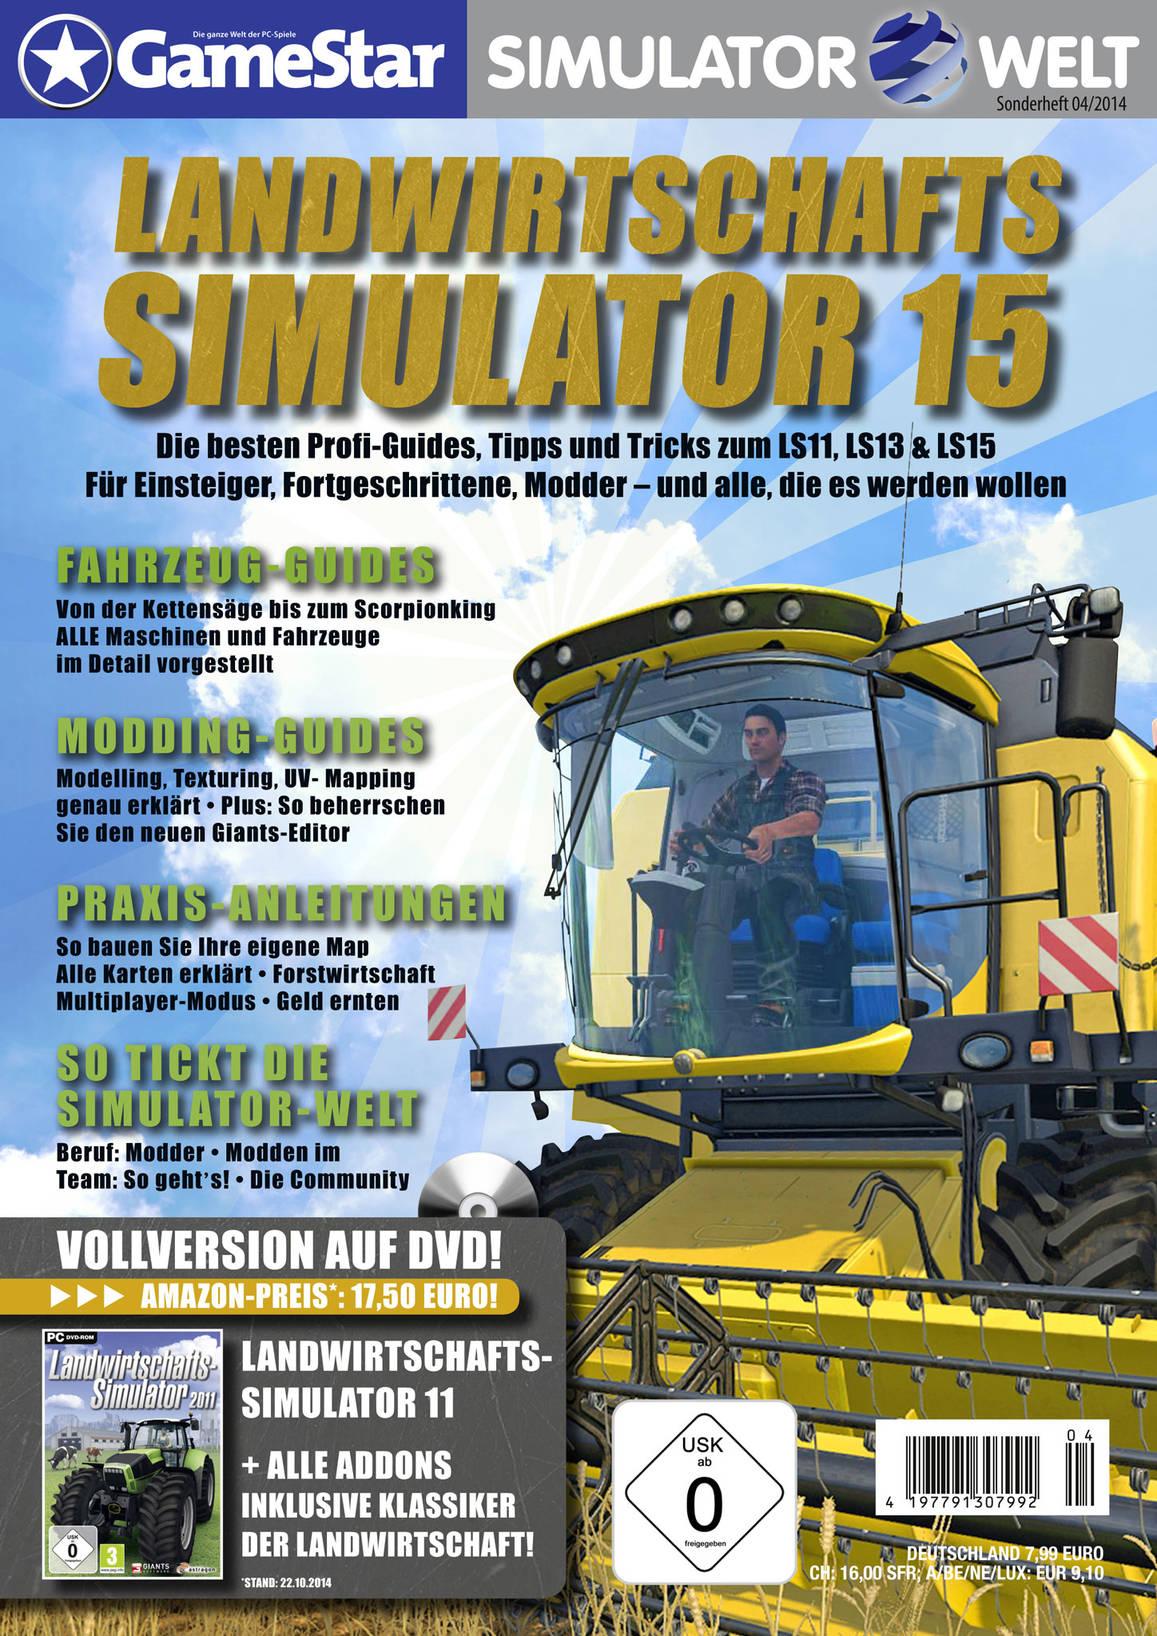 GameStar Dergisinden Farming Simulator 15 Bilgi ve Ekran ...  GameStar Dergis...